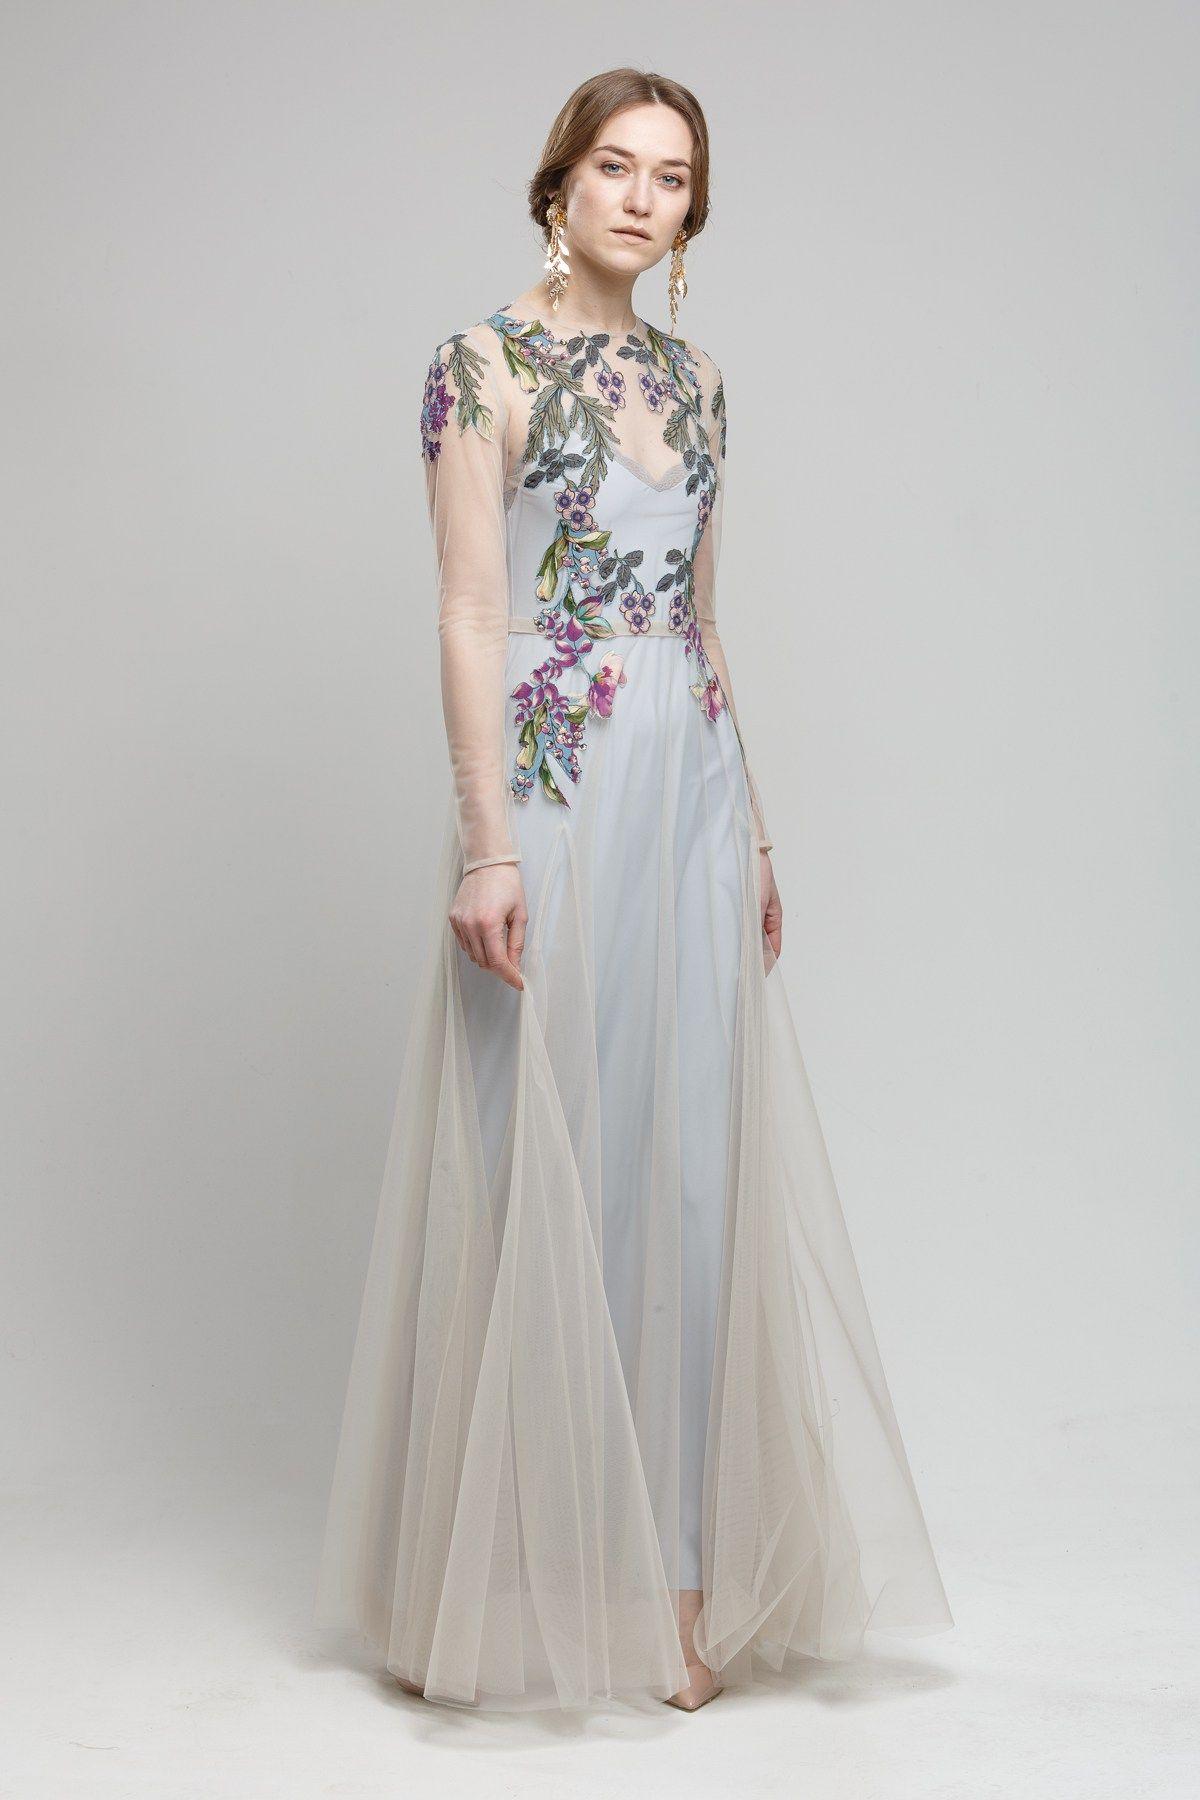 Katya Katya Dresses Dresses Bridesmaid Dresses Uk Dresses Uk